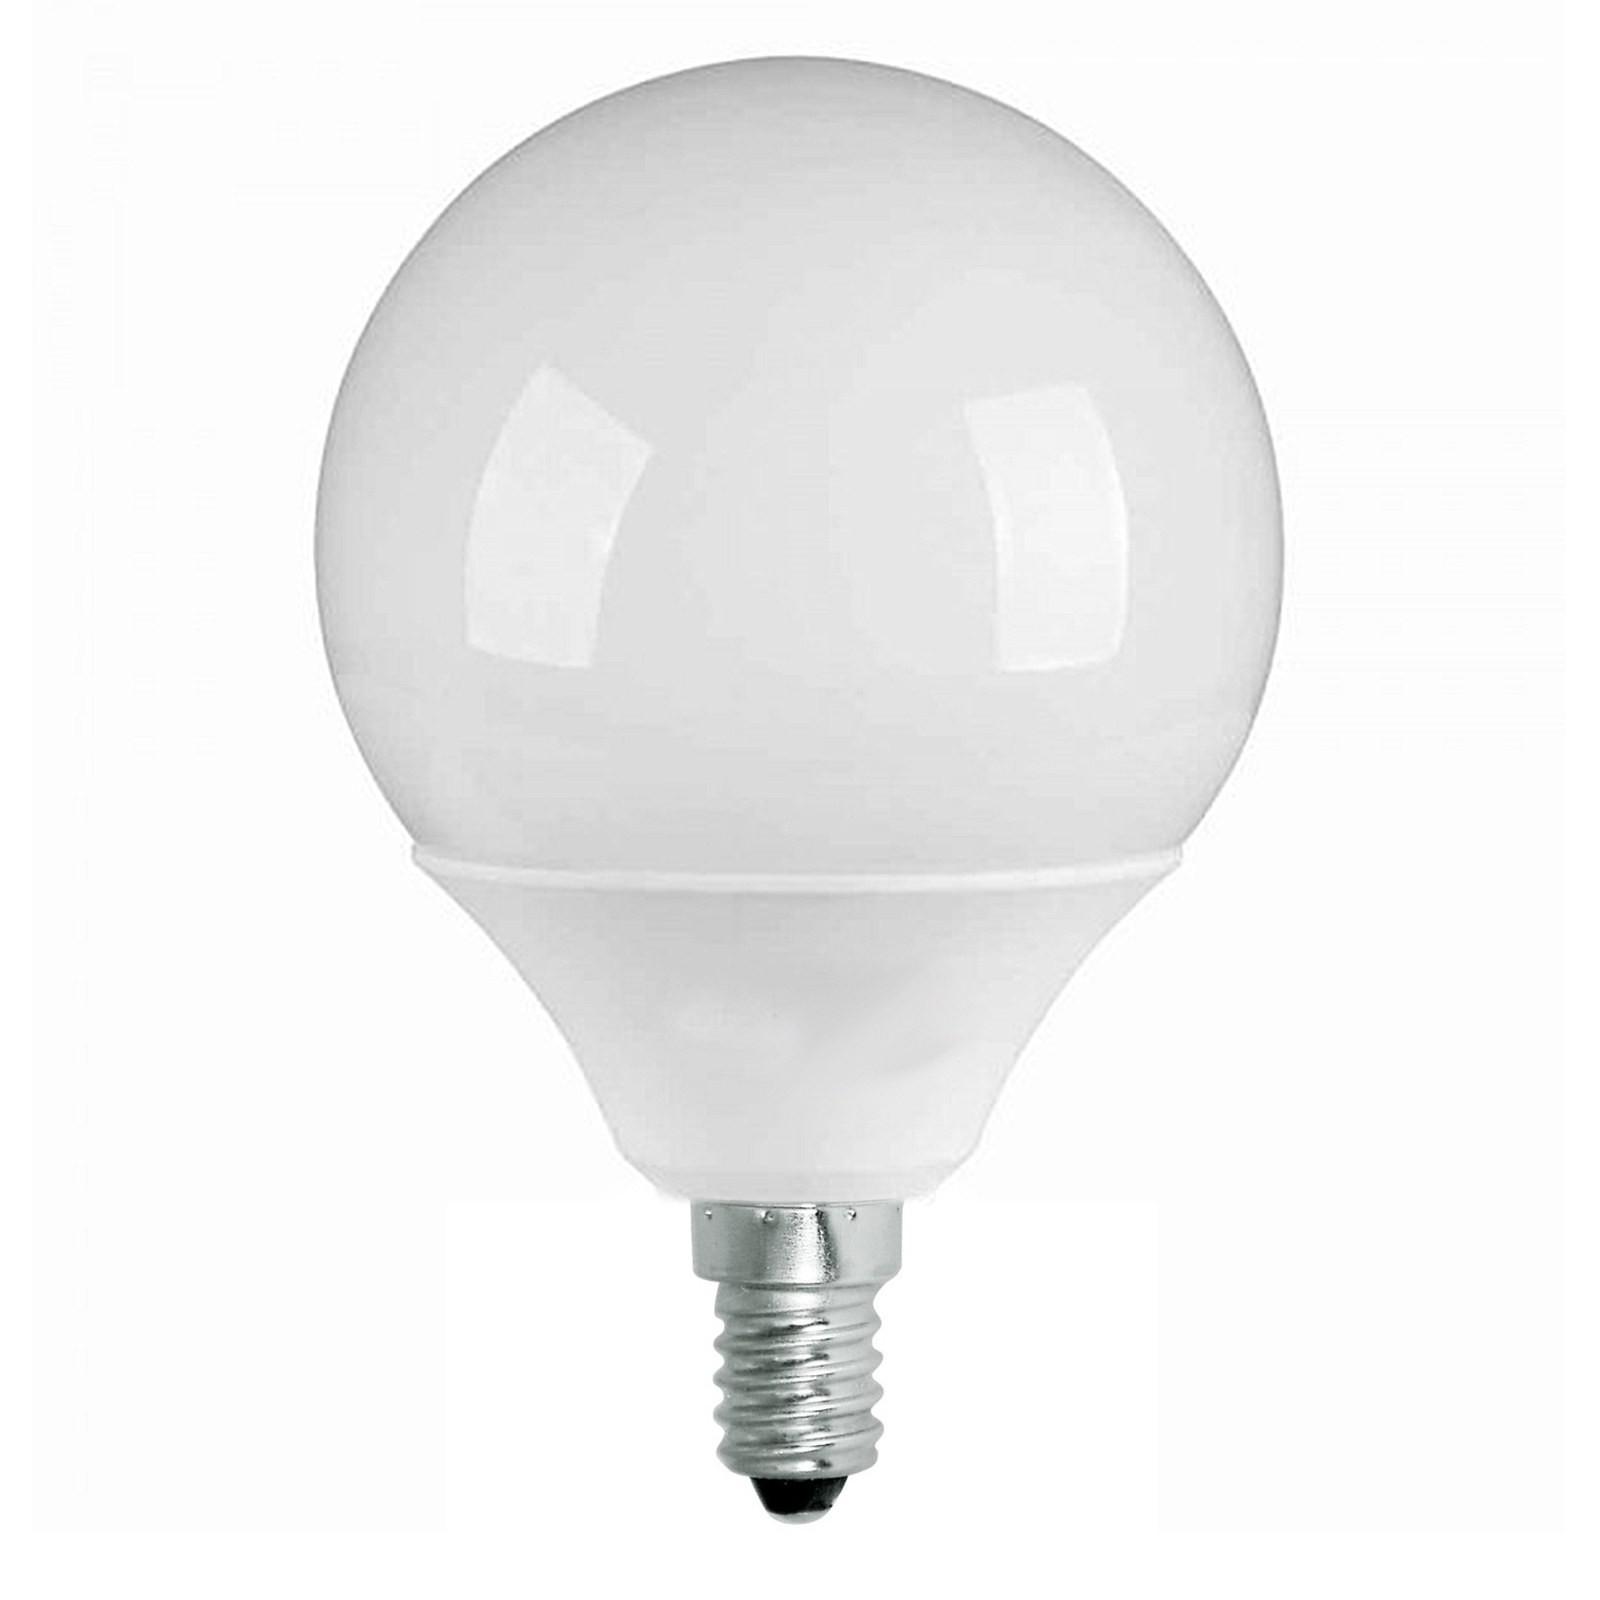 Lampada lampadina a led 4 5 45 watt attacco e14 luce for Lampadine led 5 watt